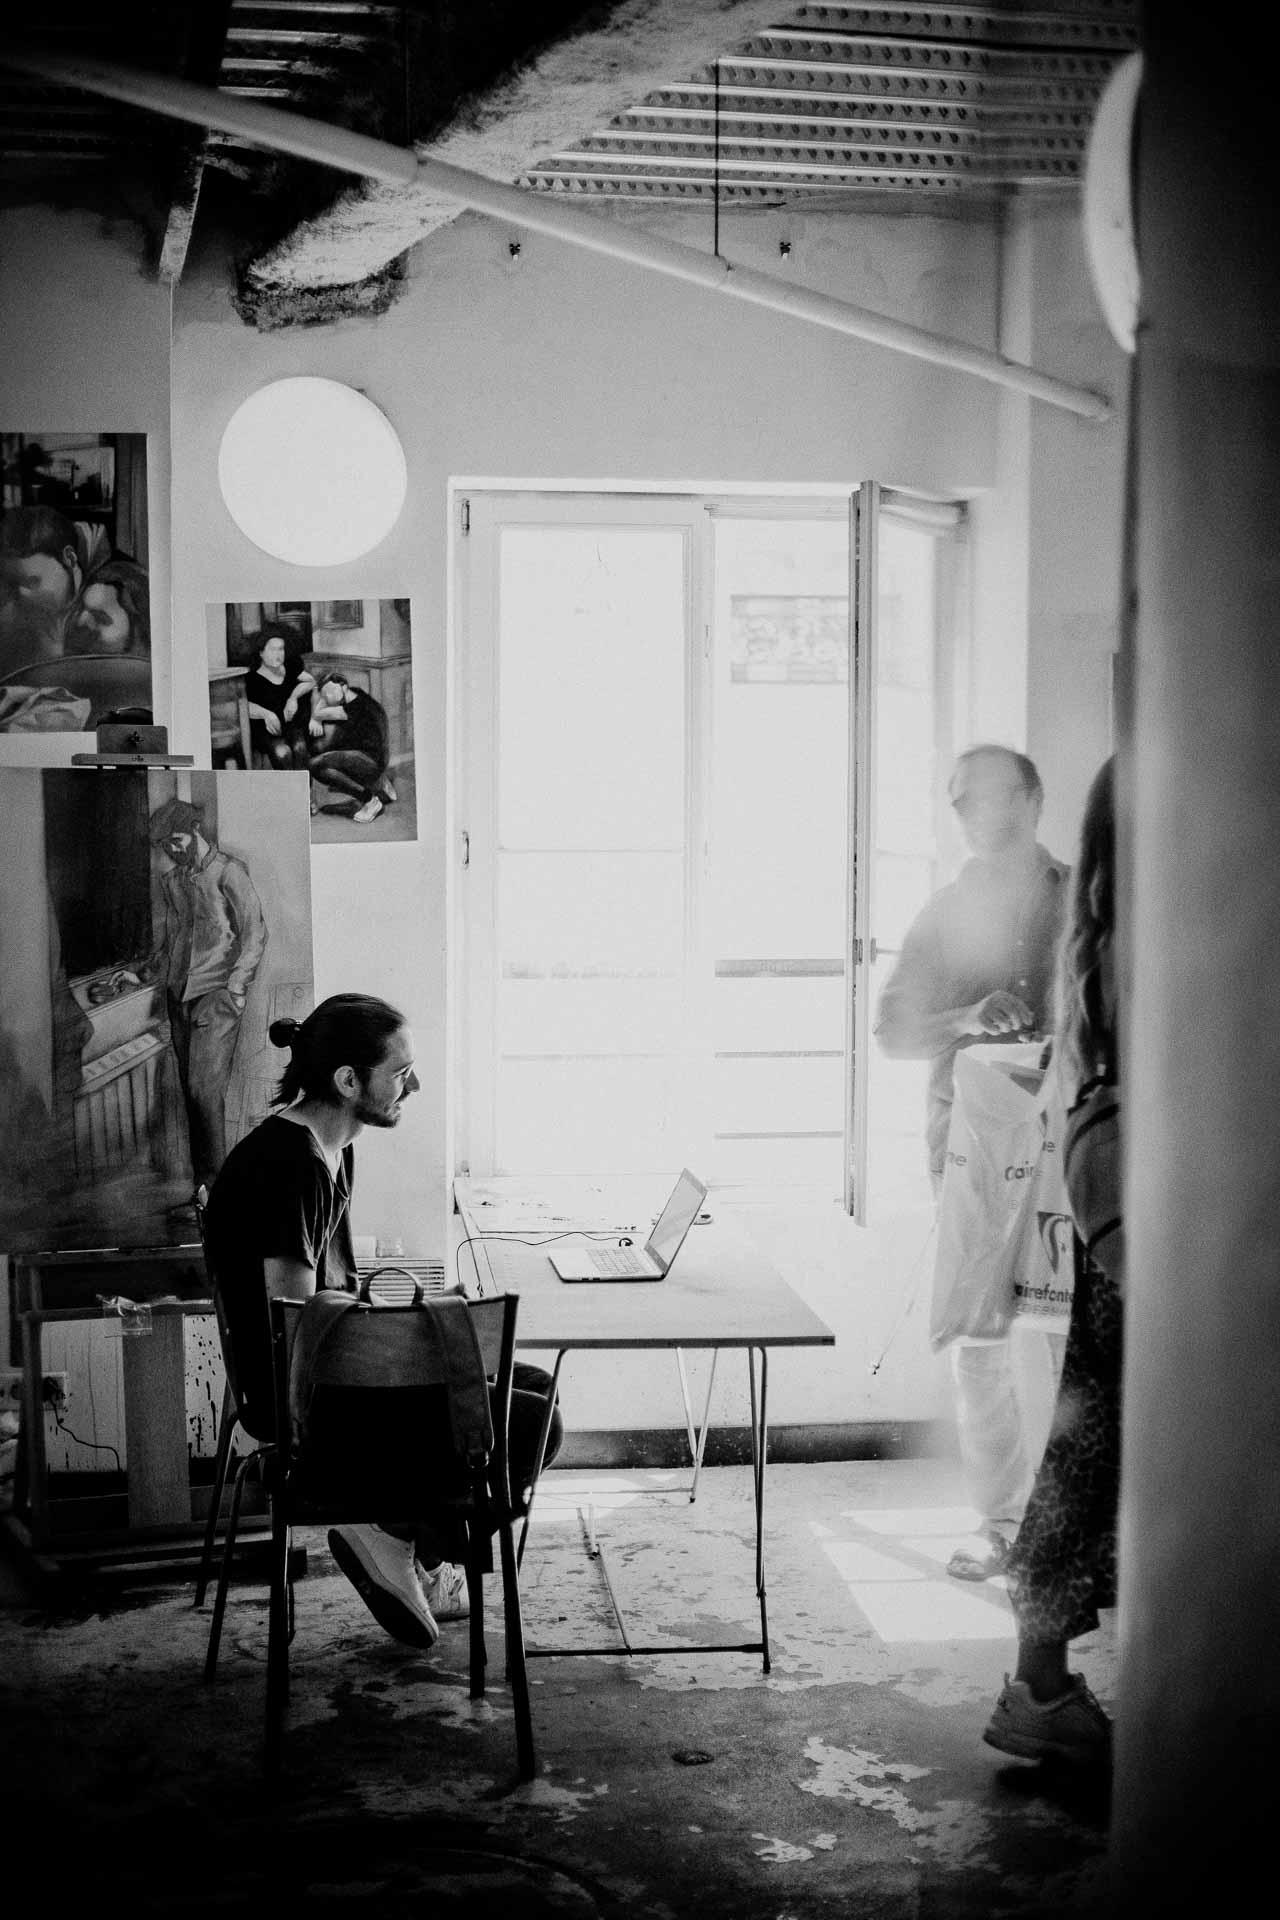 Fotografernes hobbies